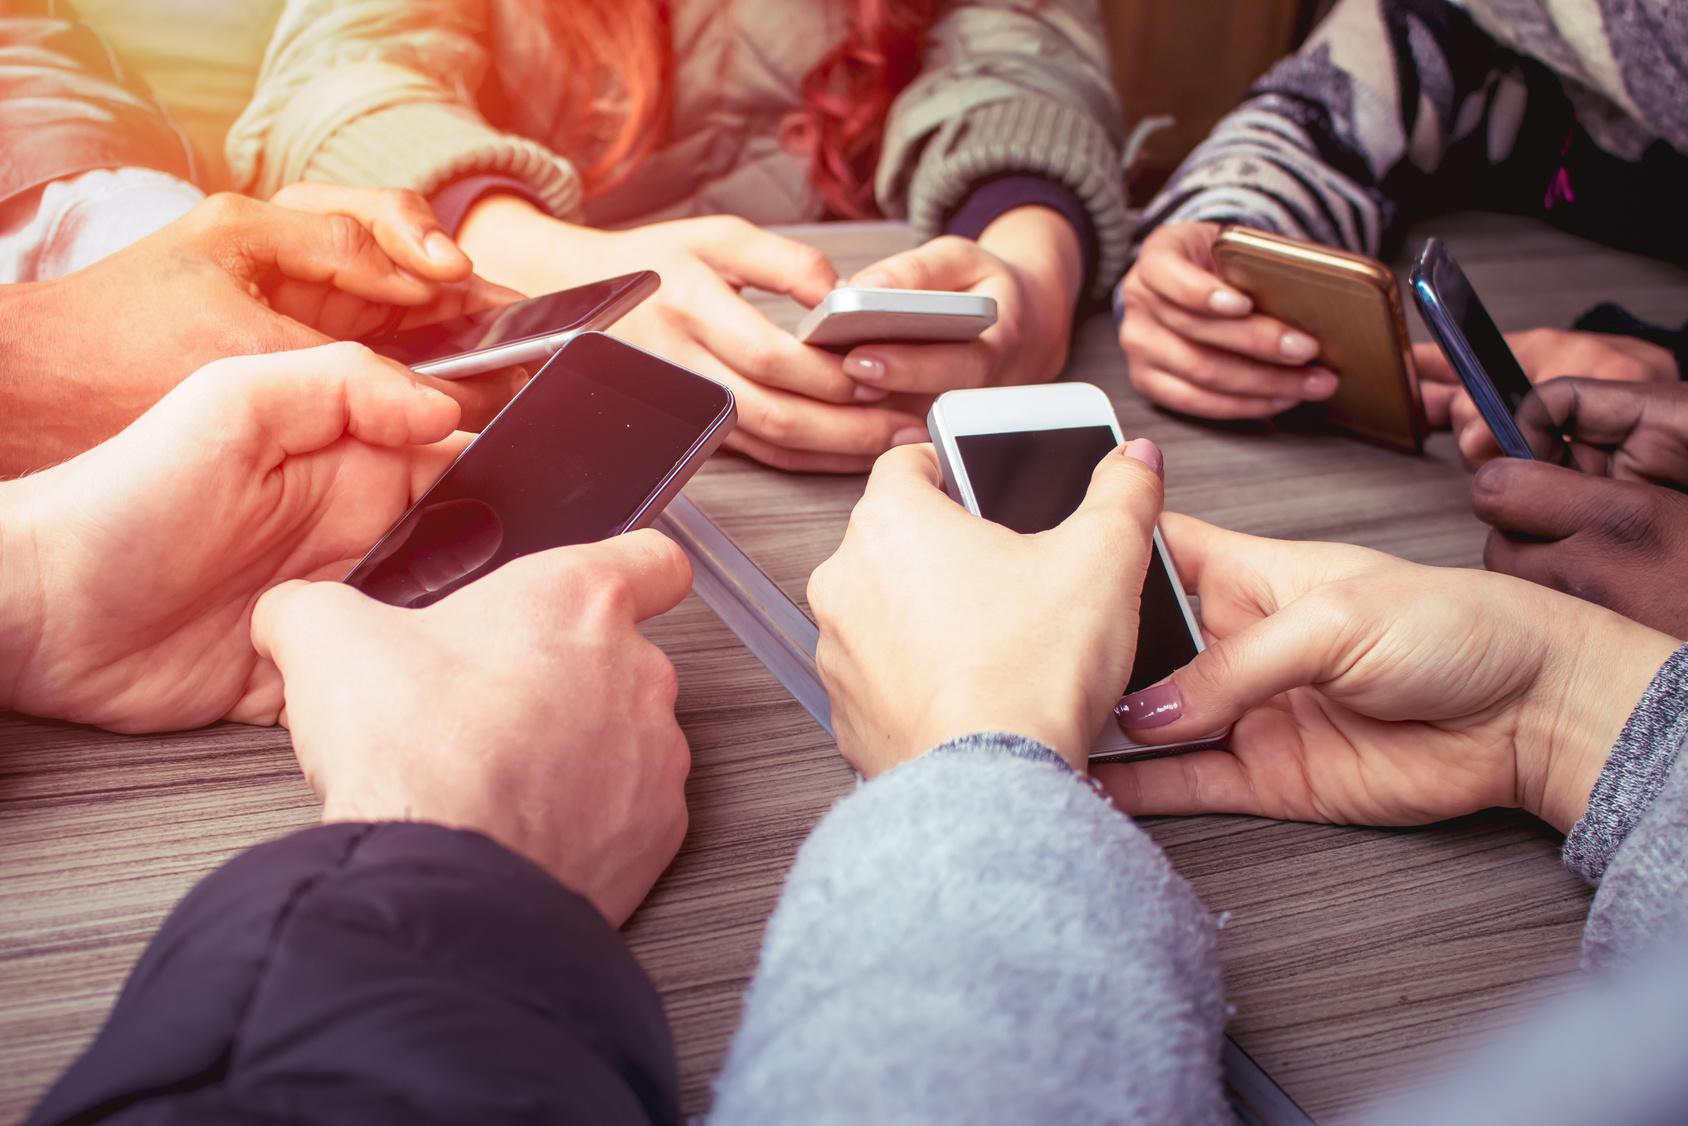 Technology may be addictive